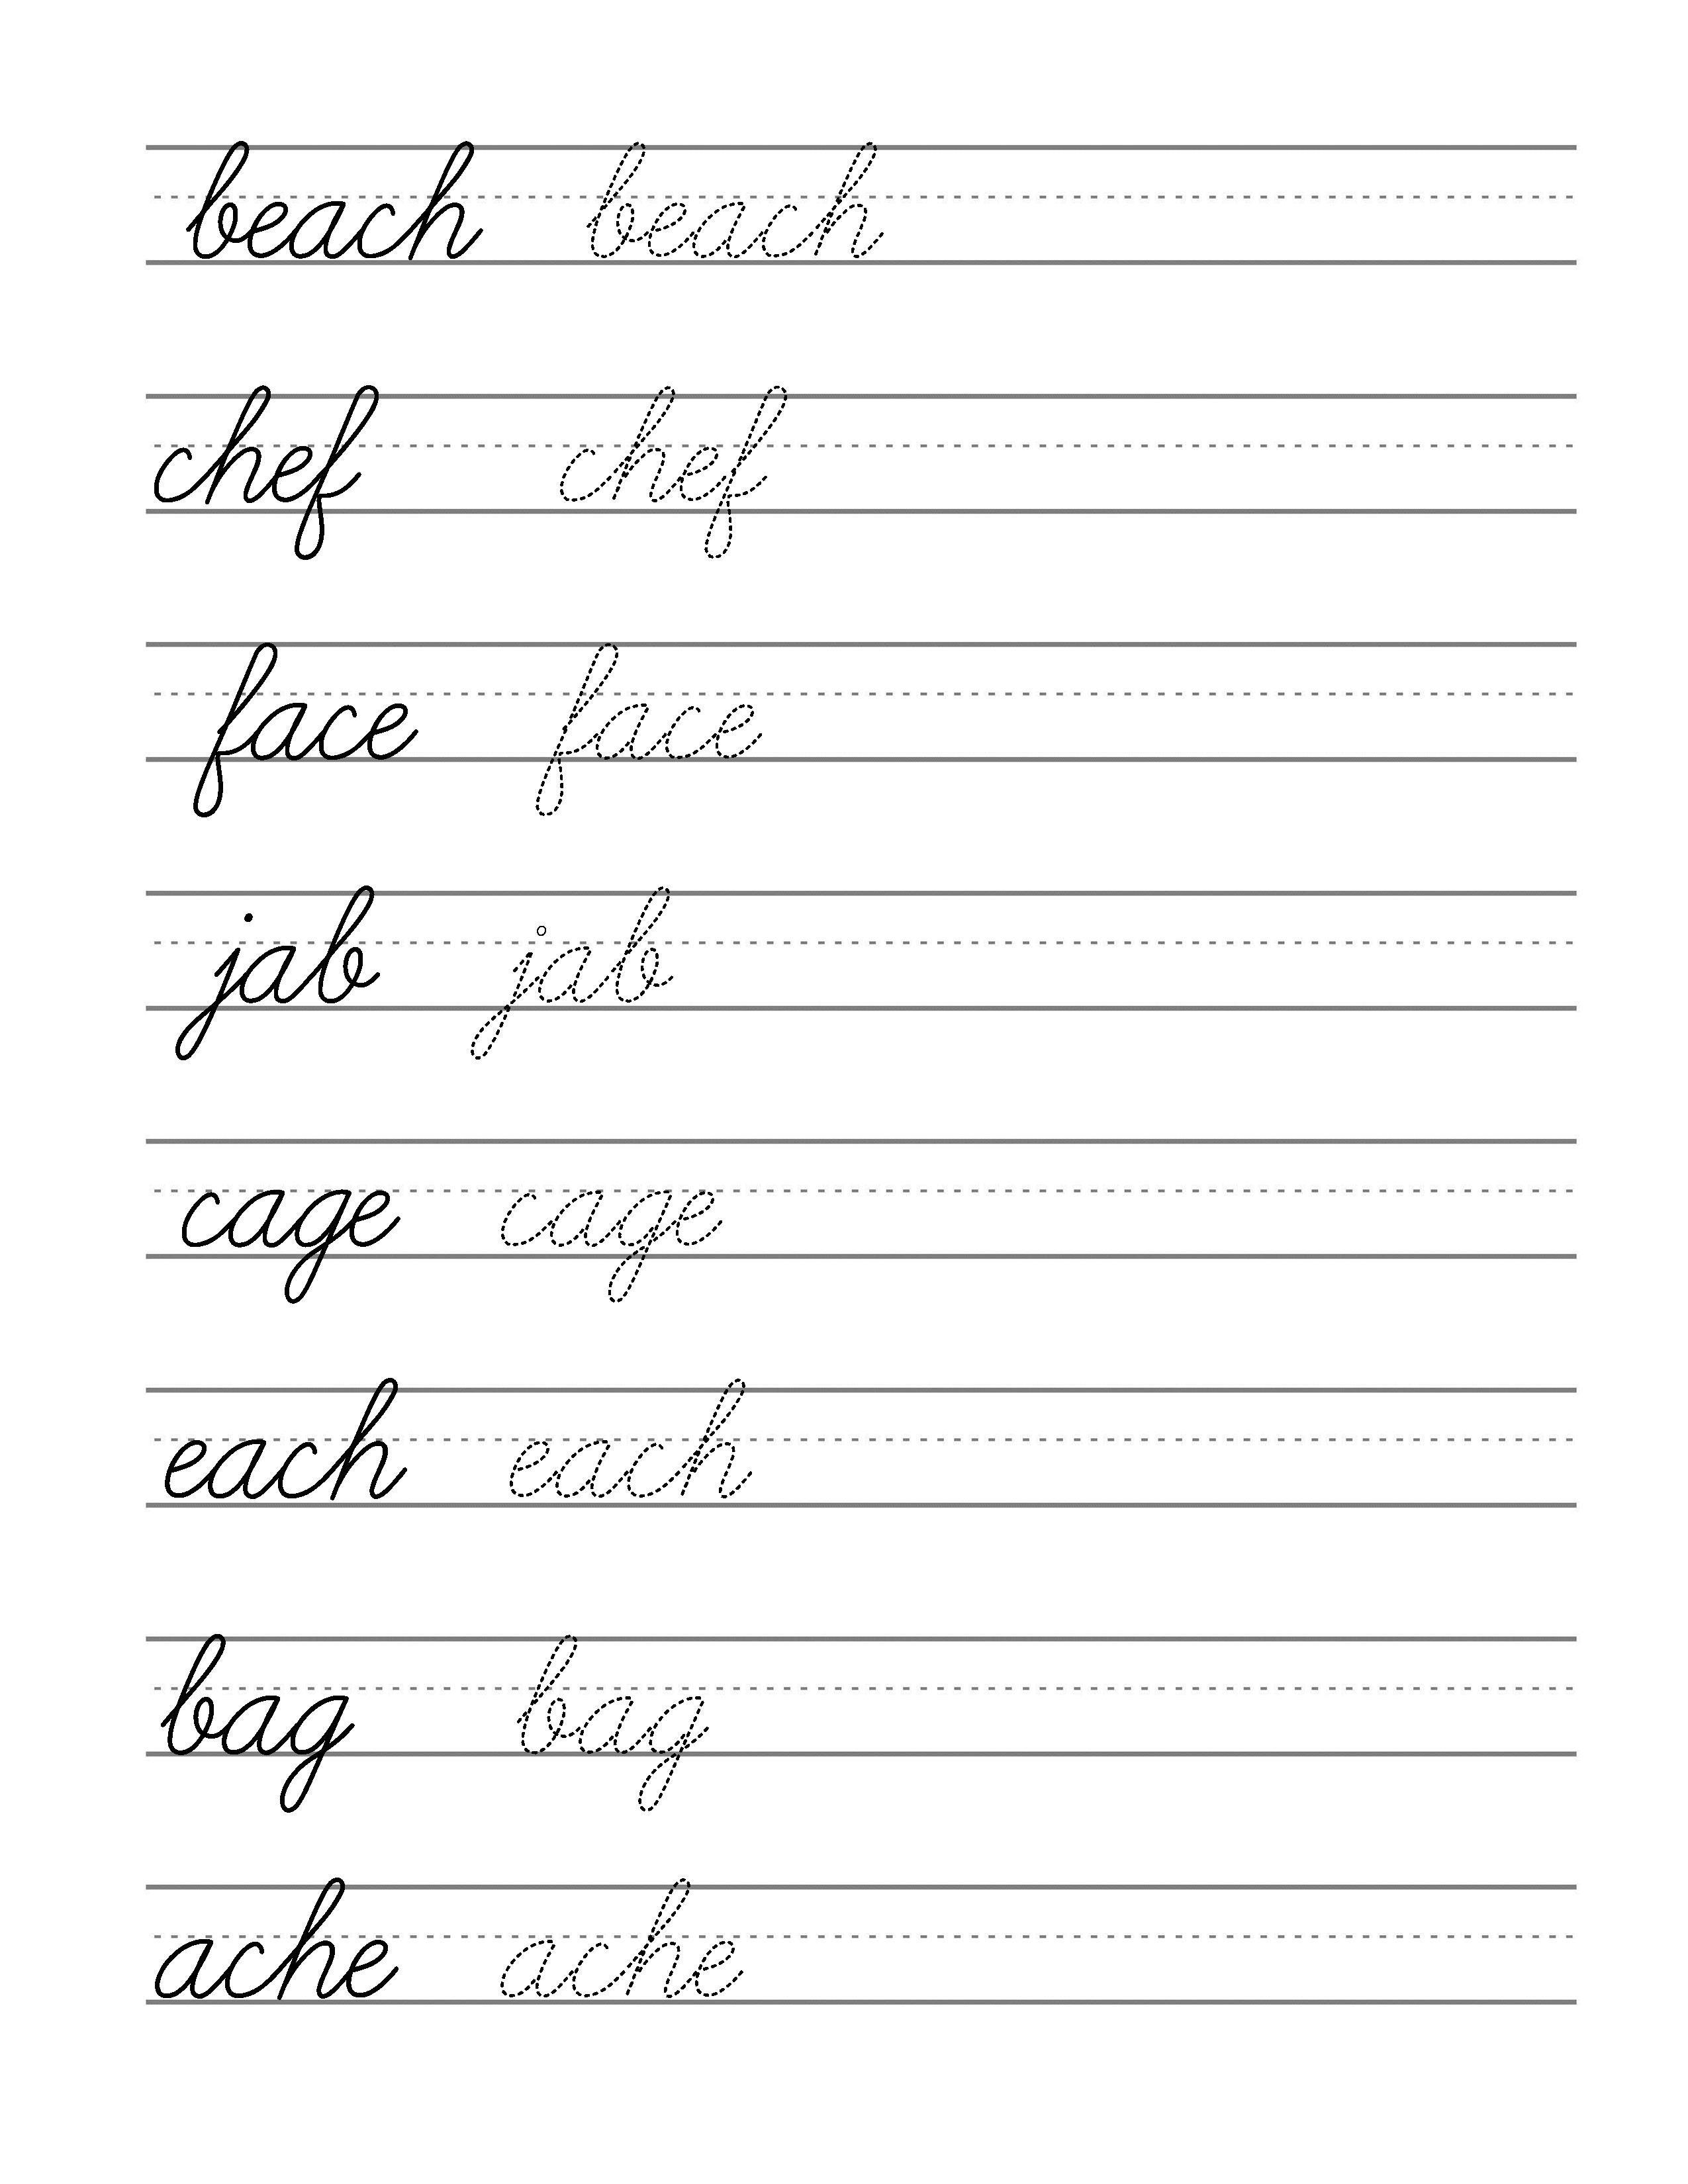 Free beginning cursive - writing template Part 3 | Writing ...